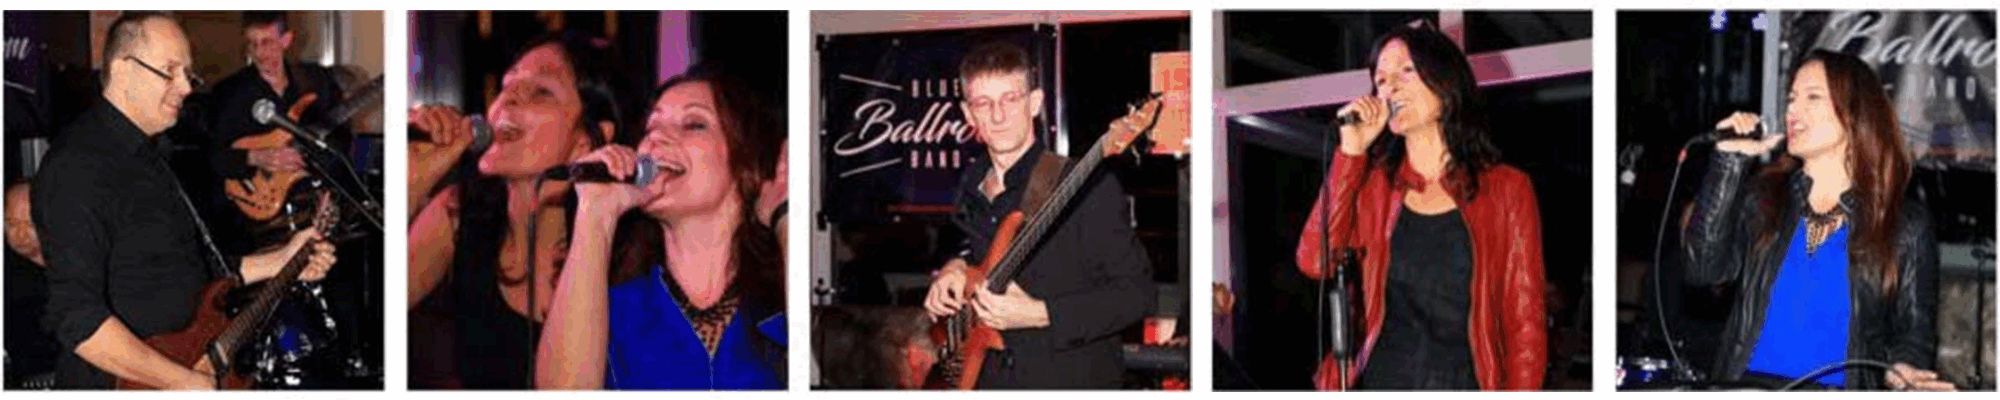 Blue Ballroom Band - Live Tanzparty  12.01.